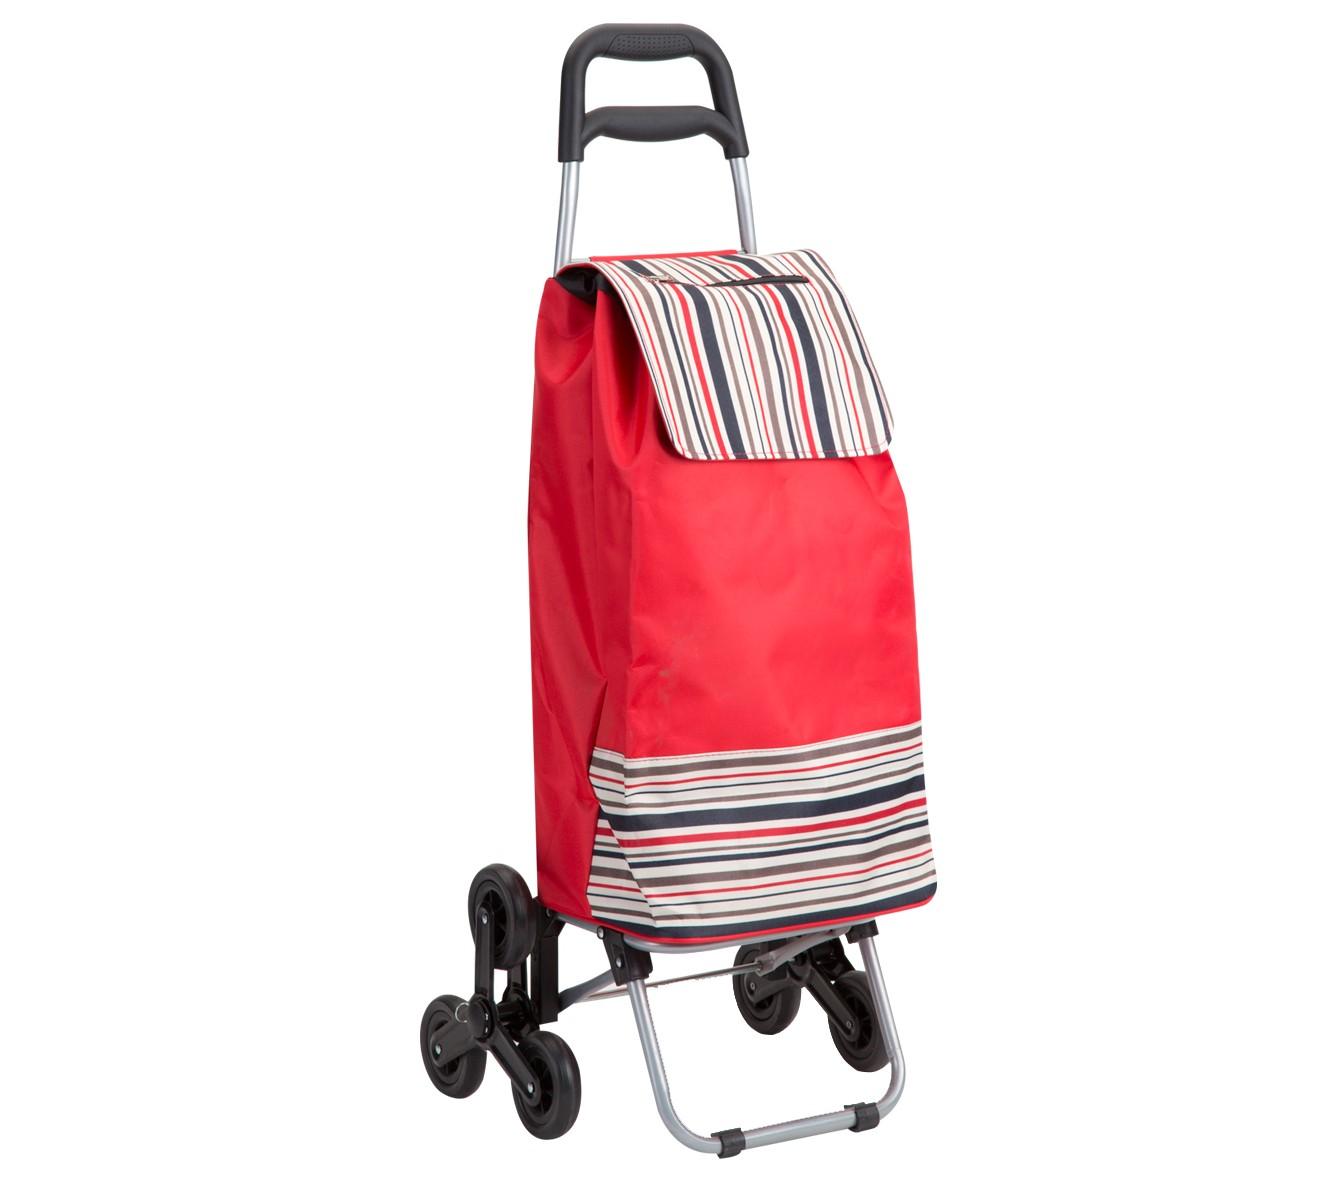 chariot de course rouge avec rayure wedestock. Black Bedroom Furniture Sets. Home Design Ideas